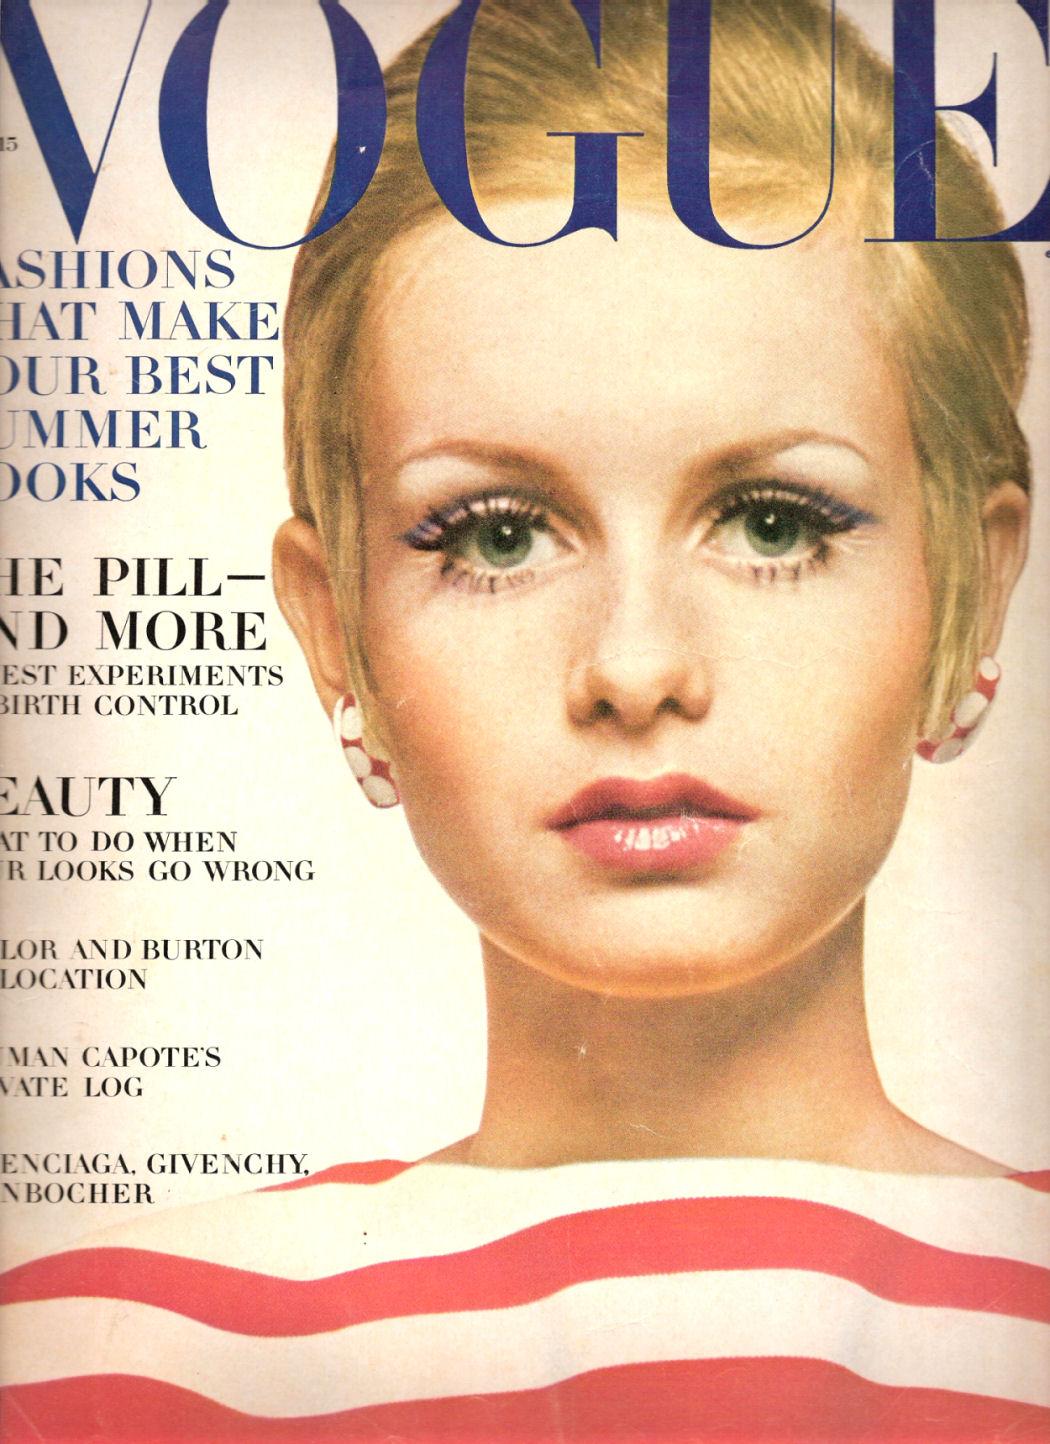 Vogue The Top Selling Fashion Magazine: Giorgadze David's: Twiggy As A Fashion Icon